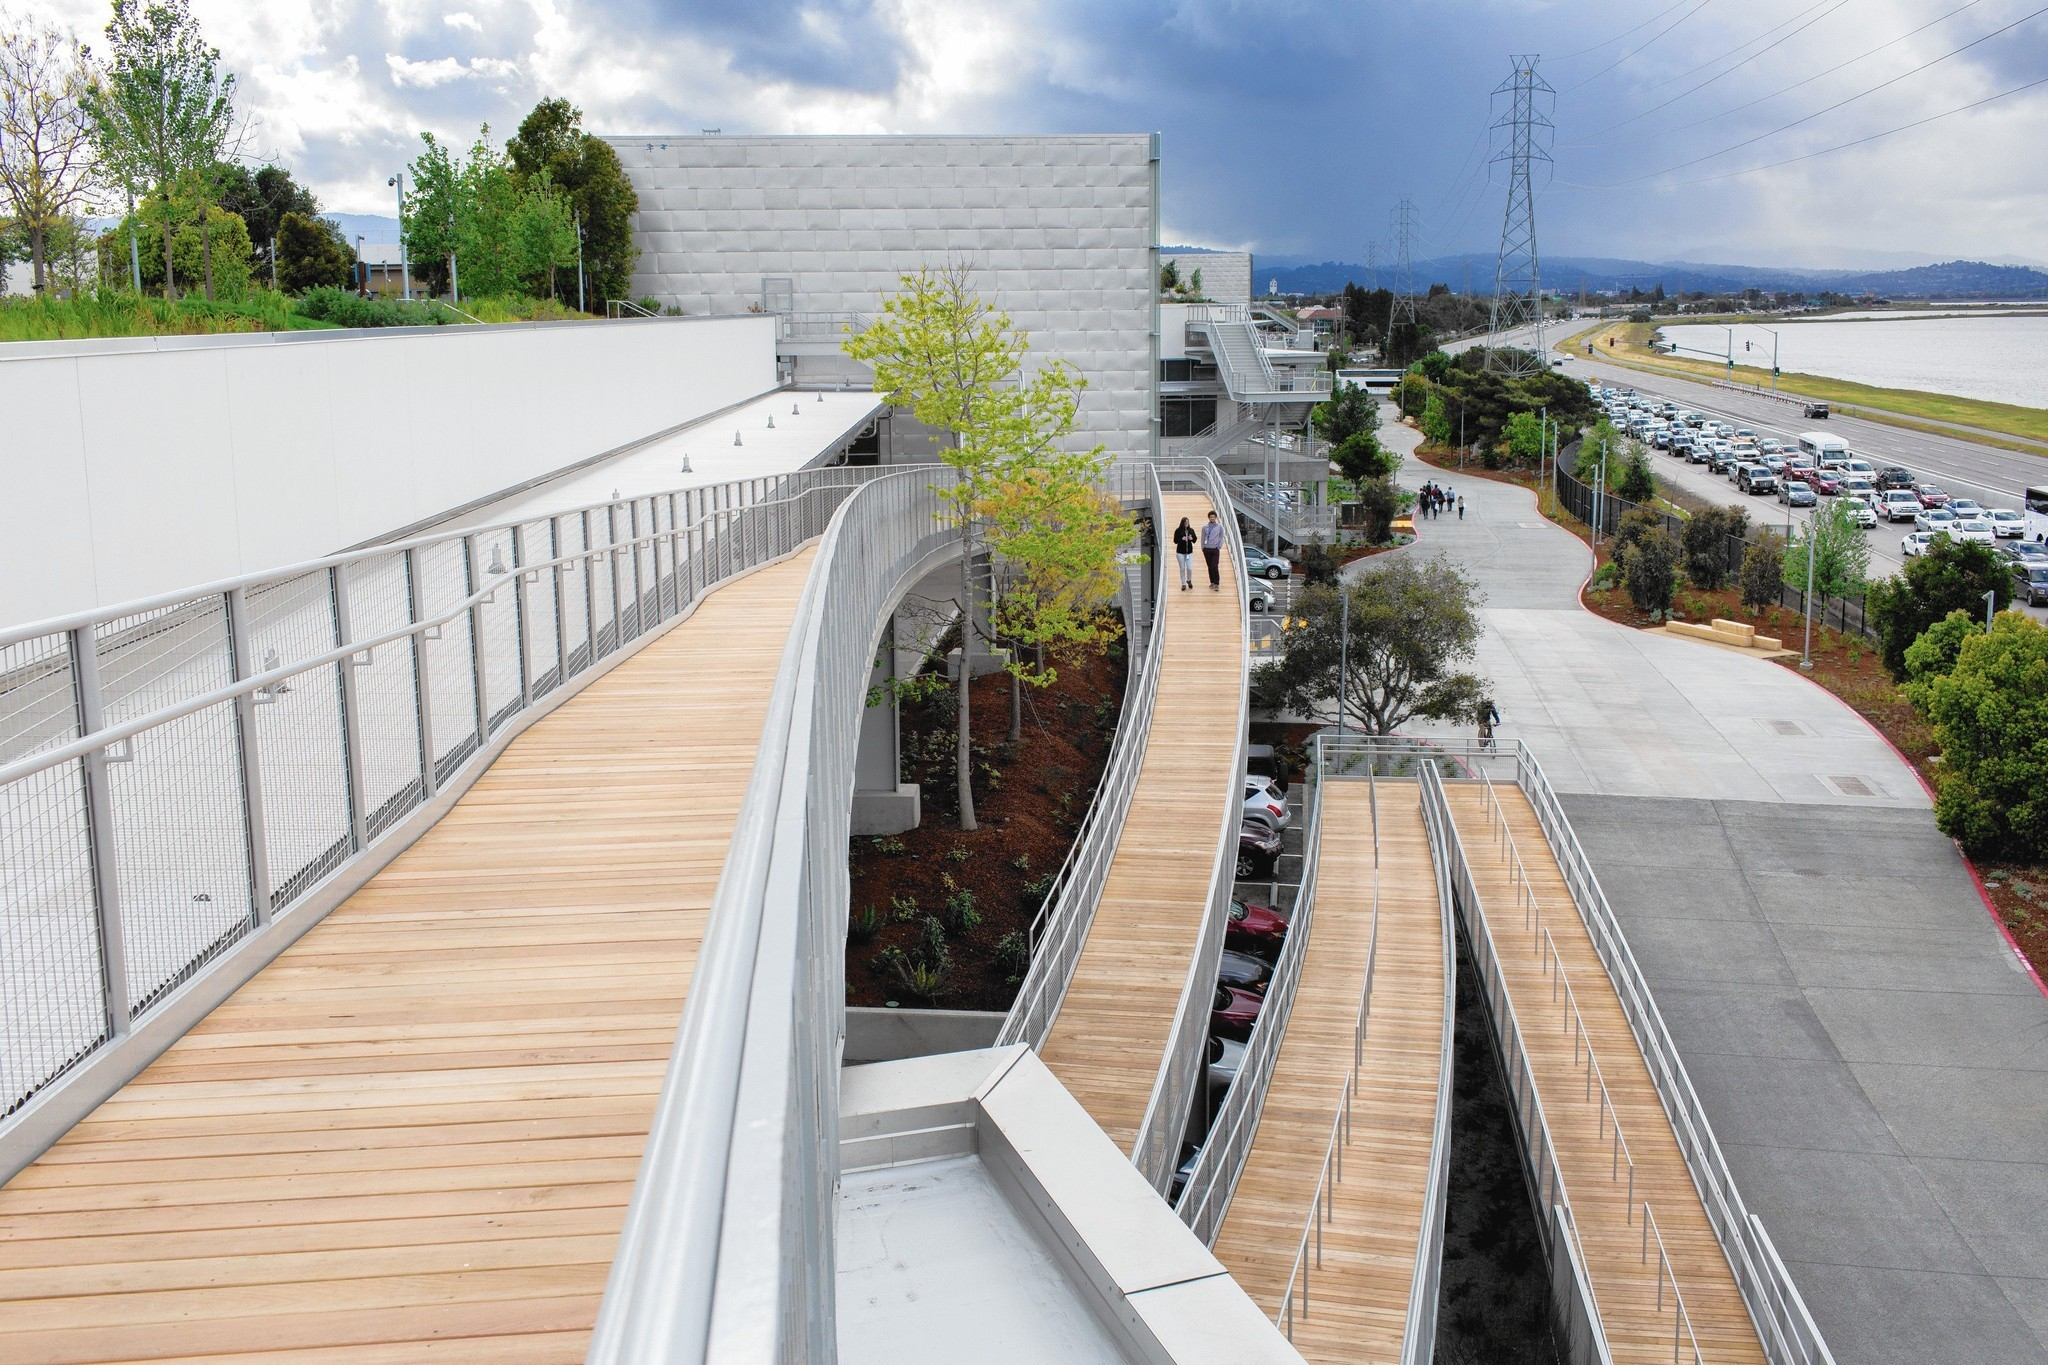 A low-key Facebook building? In Gehry's hands, Zuckerberg has it both ways